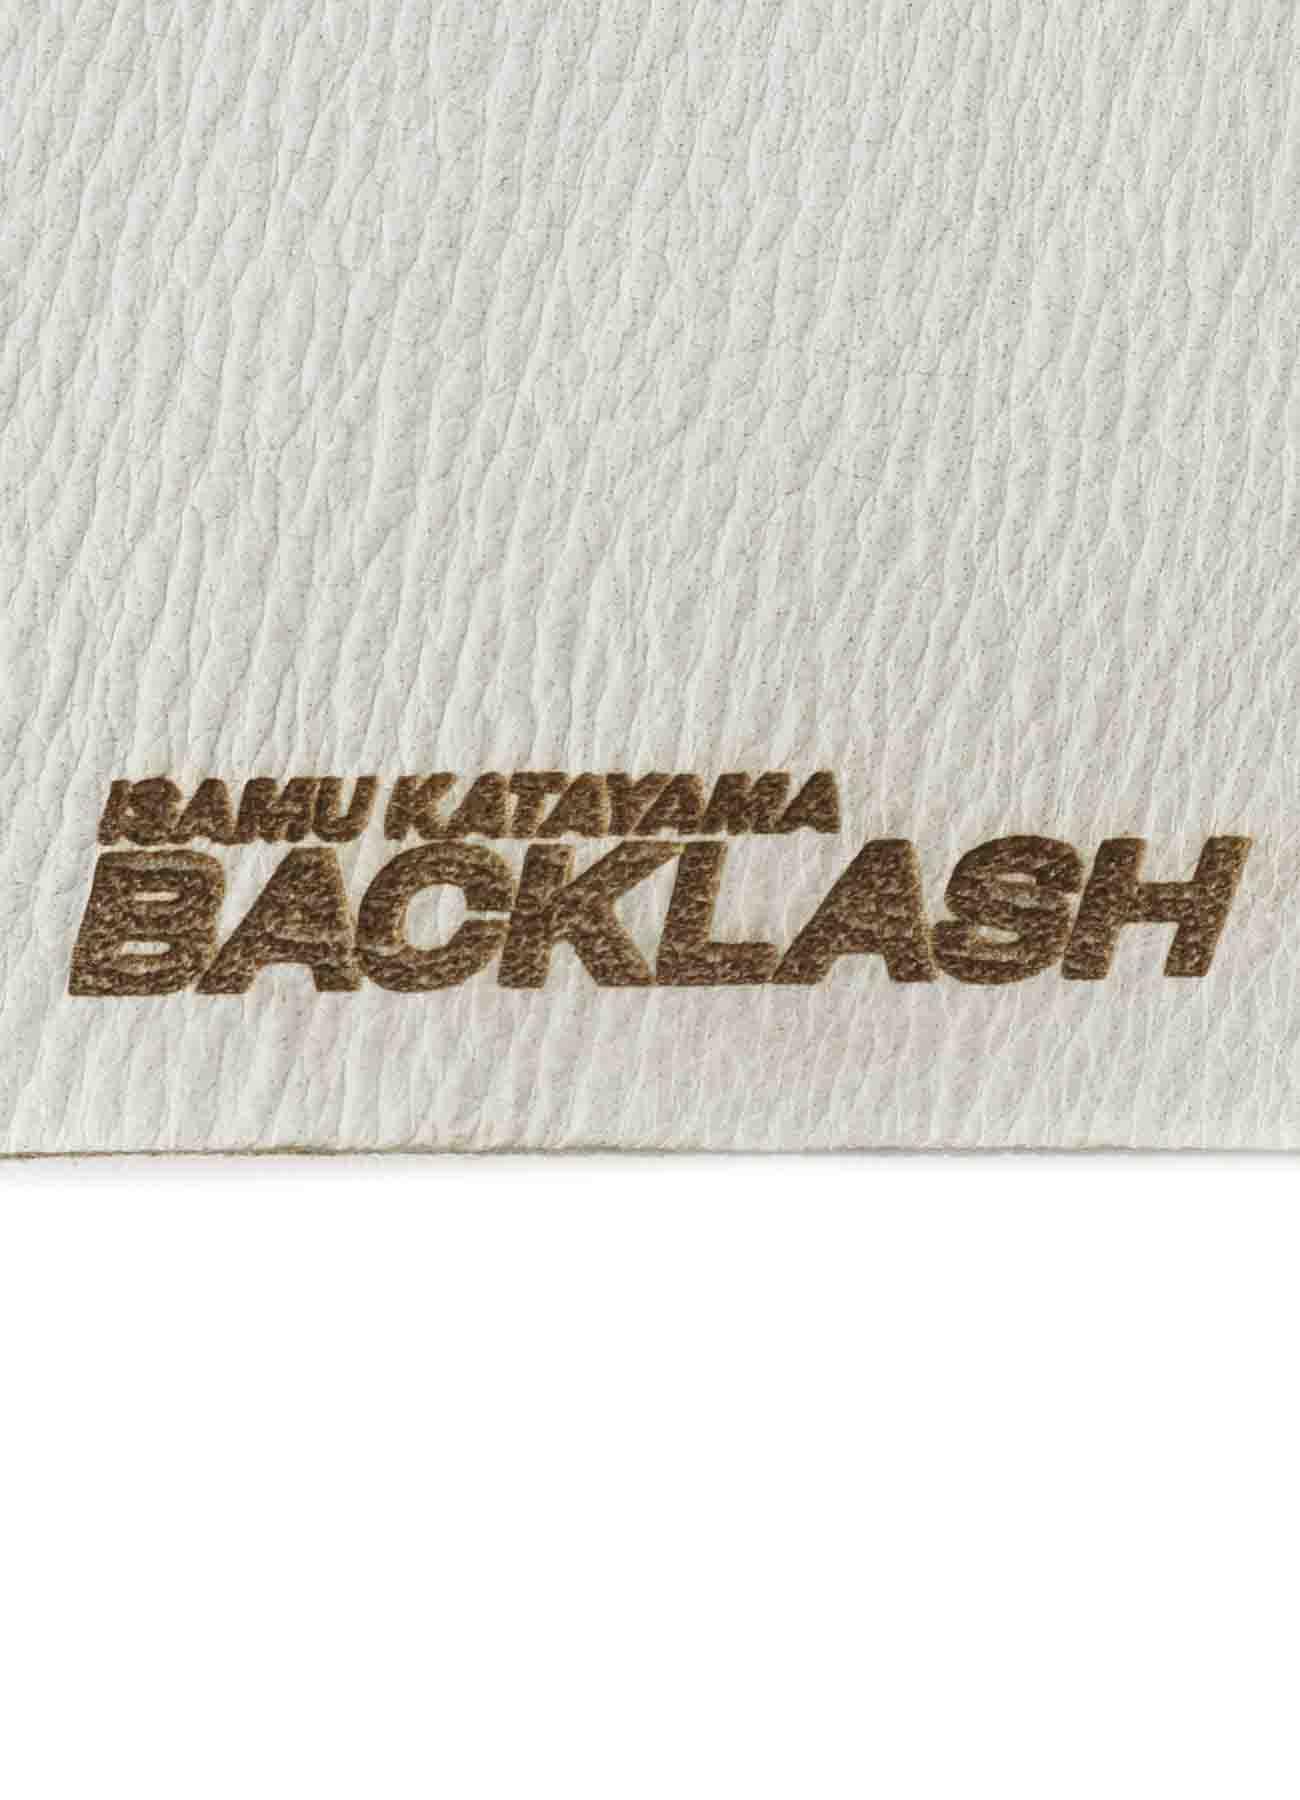 BACKLASH ディアスキン レザーマスク